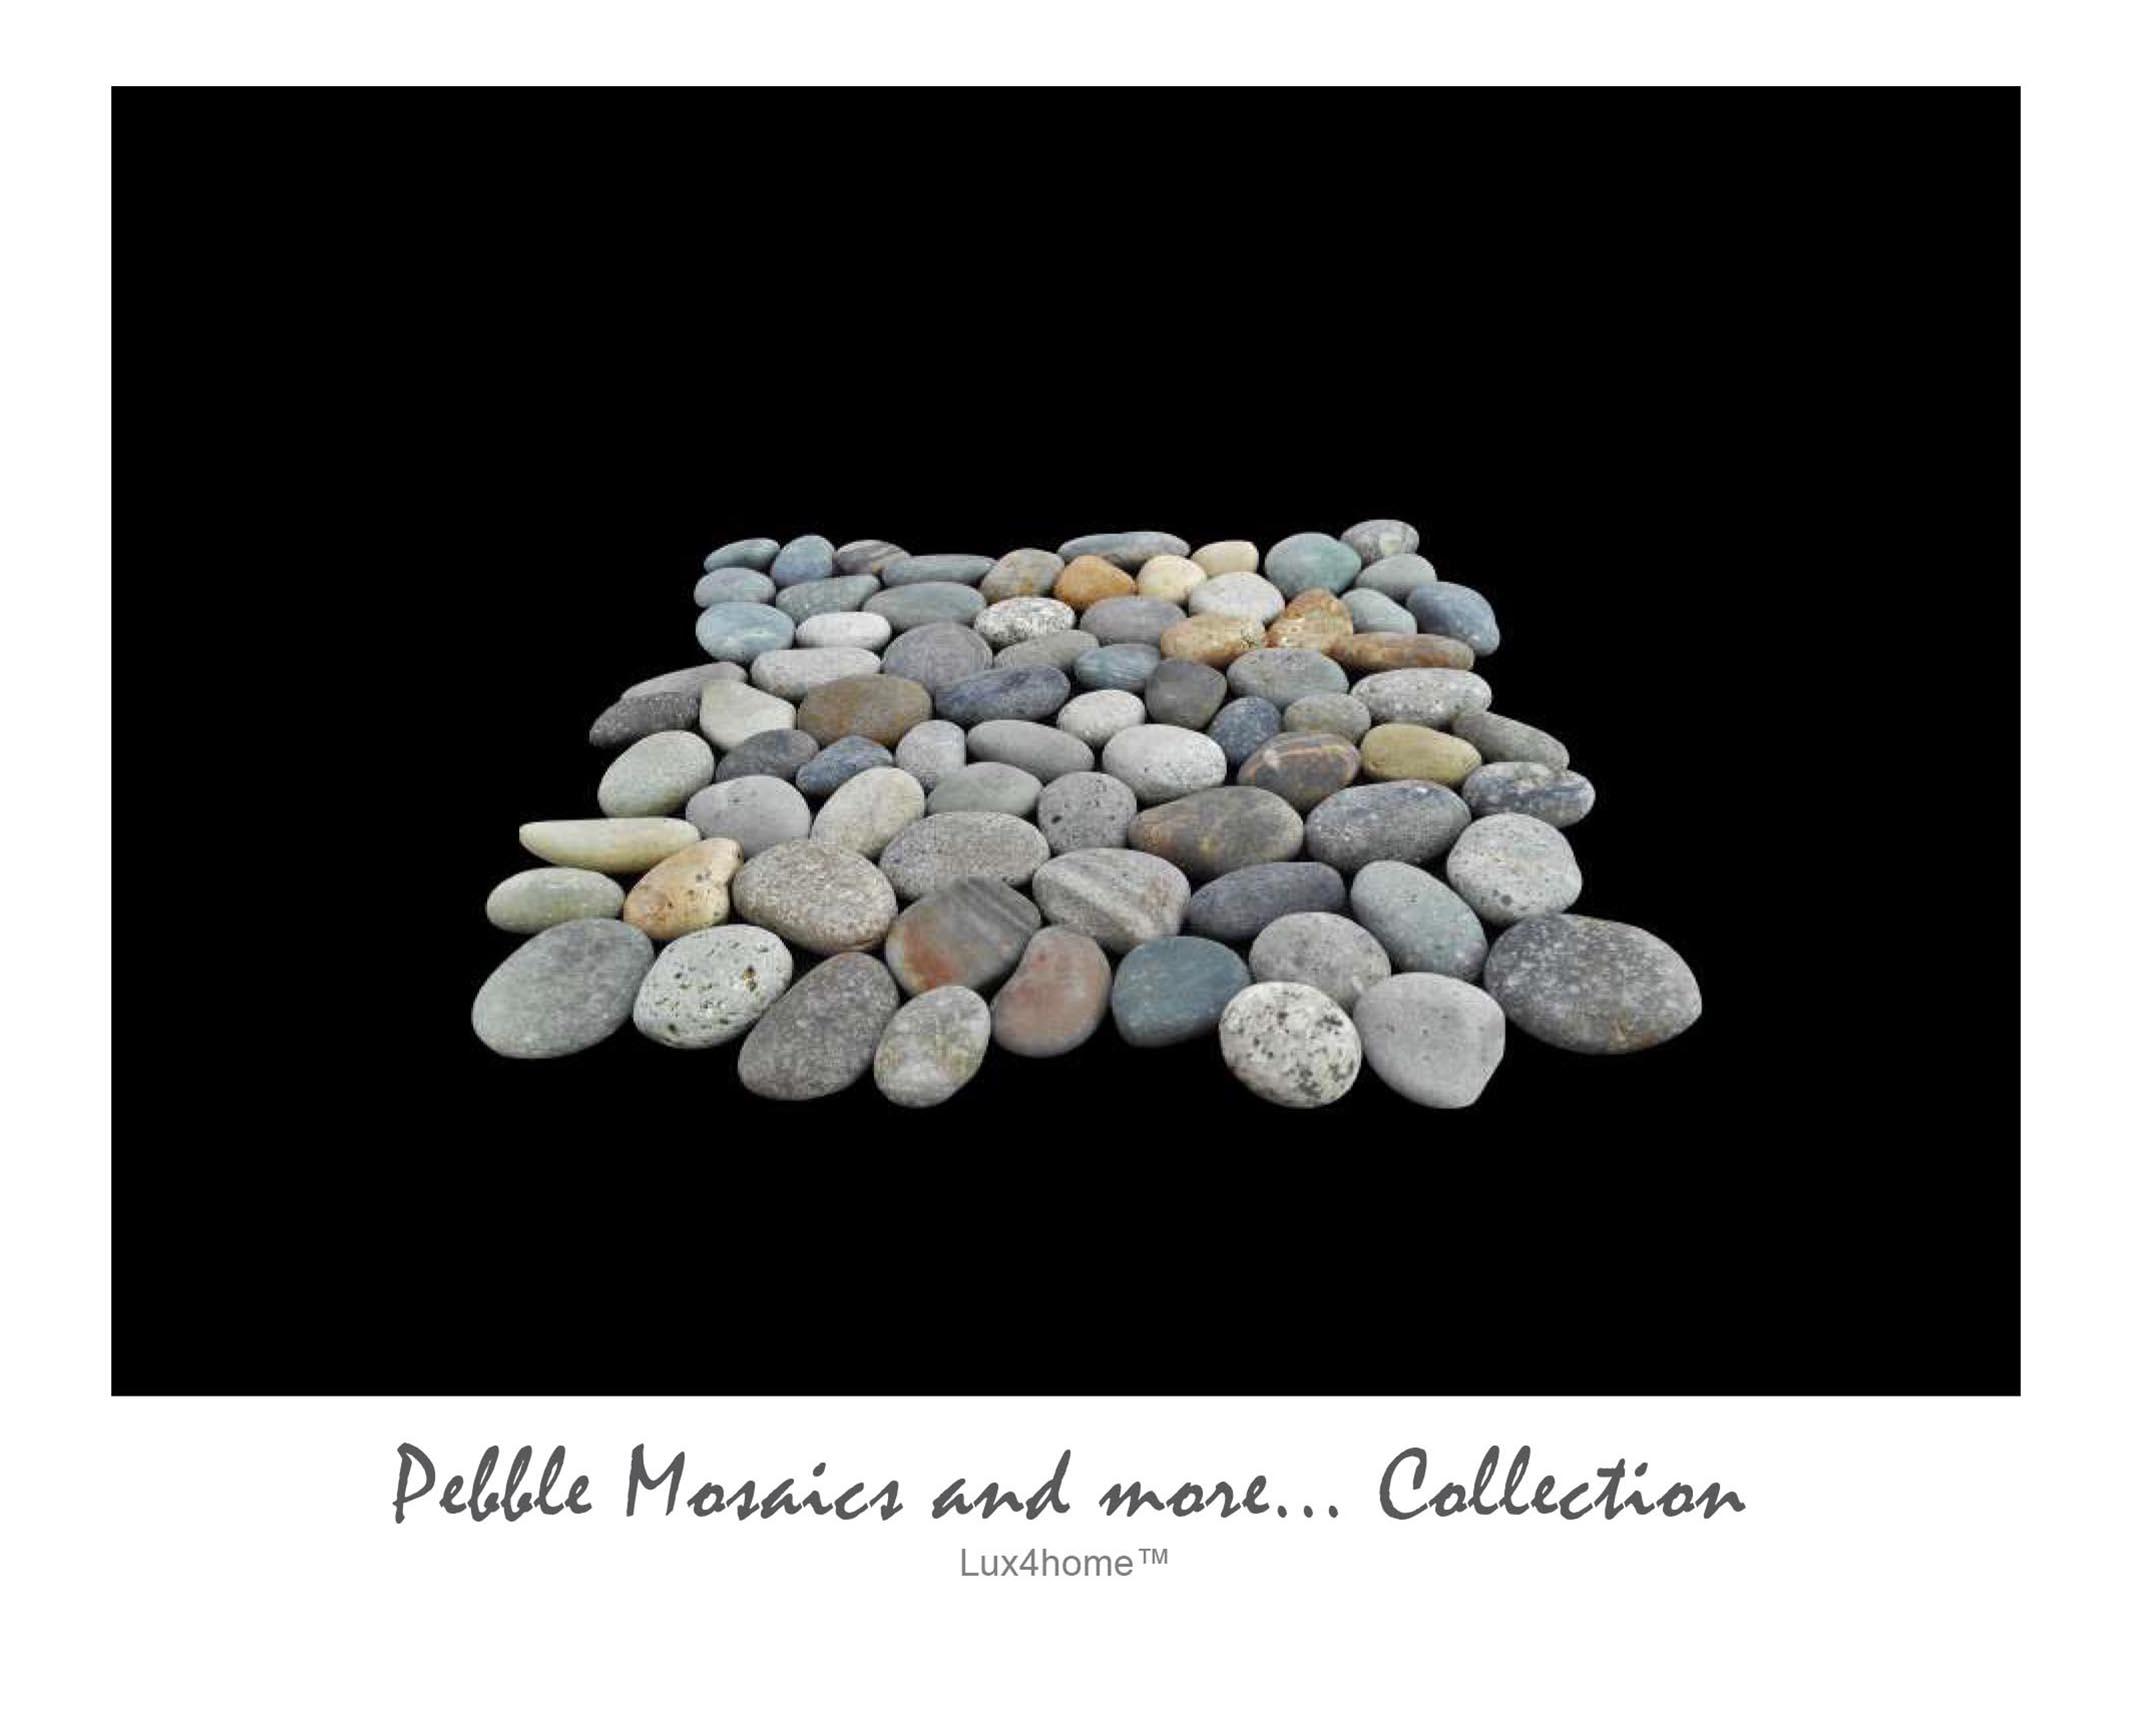 Pebble Mosaic Producer